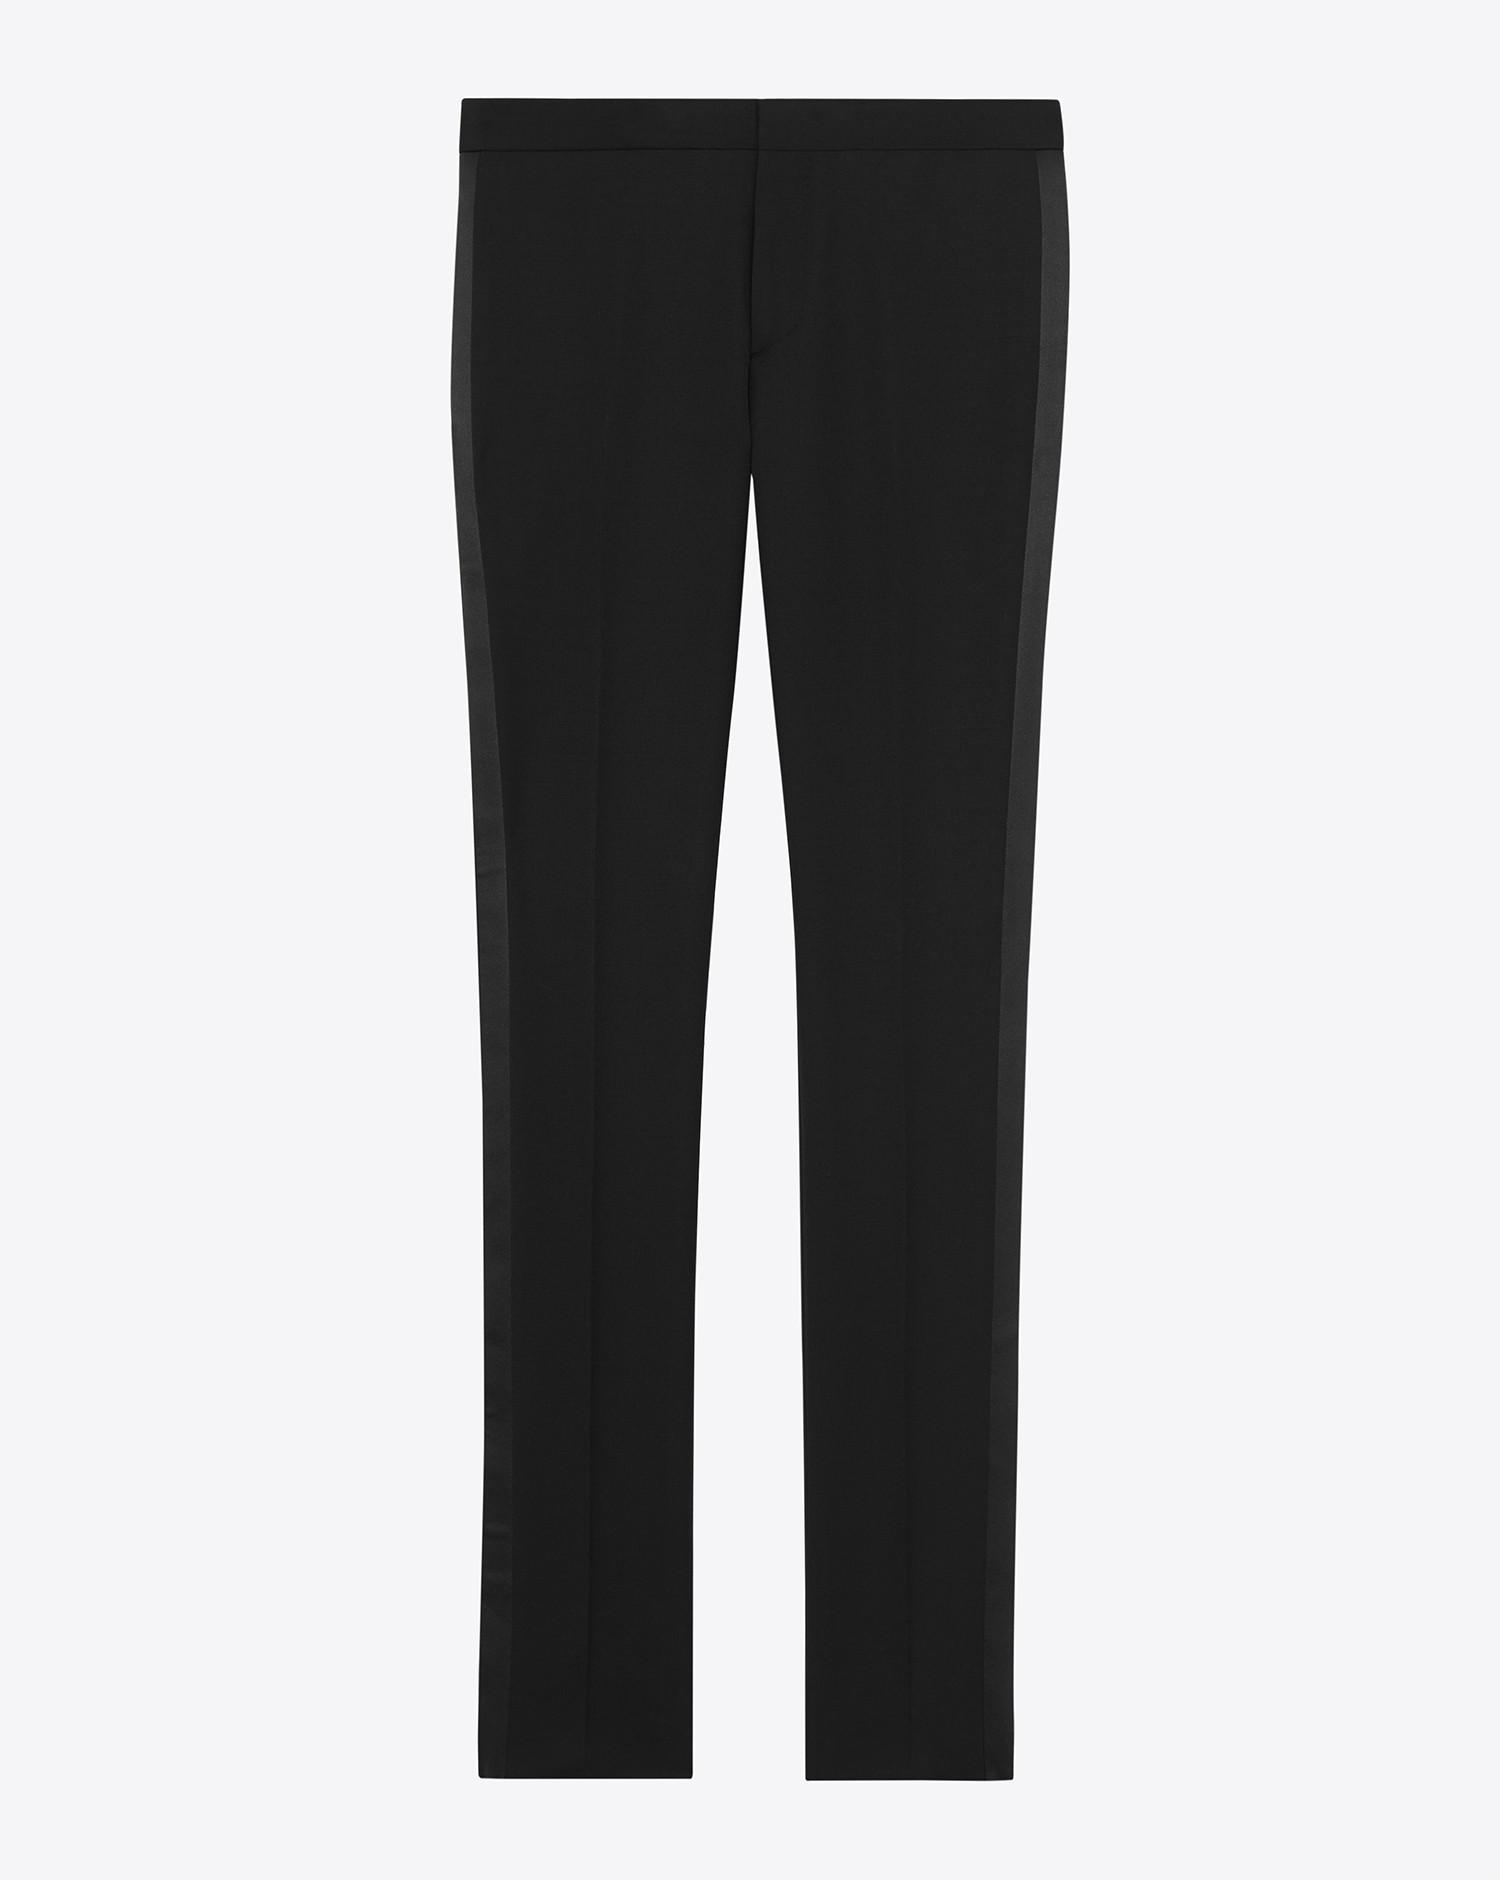 saint-laurent-iconic-le-smoking-trousers